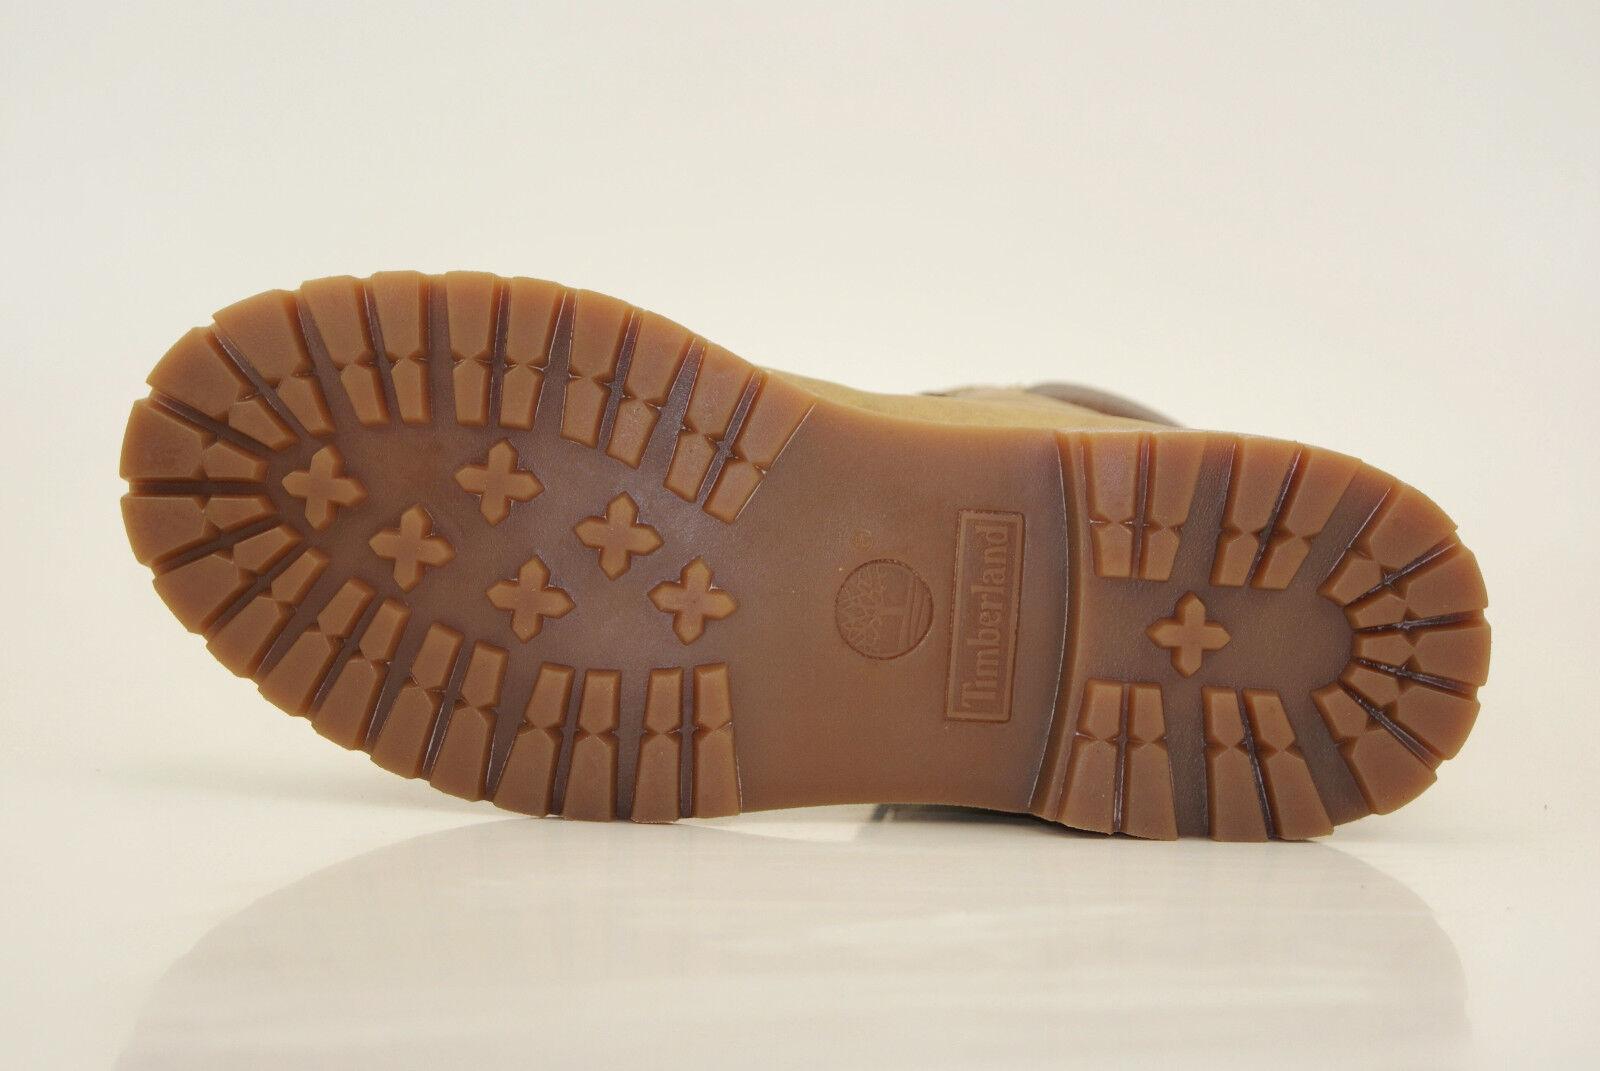 Timberland 6 Pollici Authentics Premium stivali Impermeabili Donna | | | riparazione  | Gentiluomo/Signora Scarpa  1cf0ee